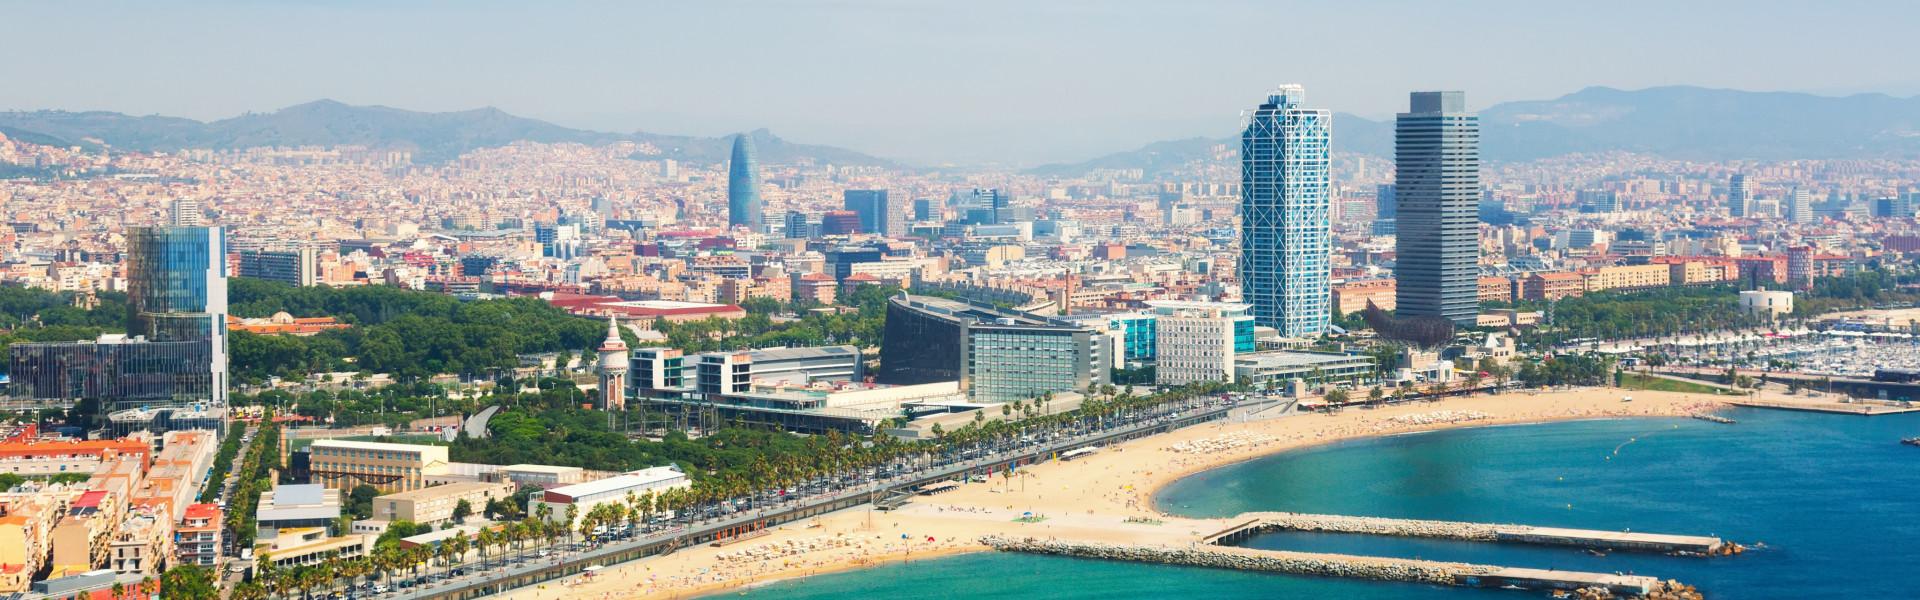 Destination image of Barcelone